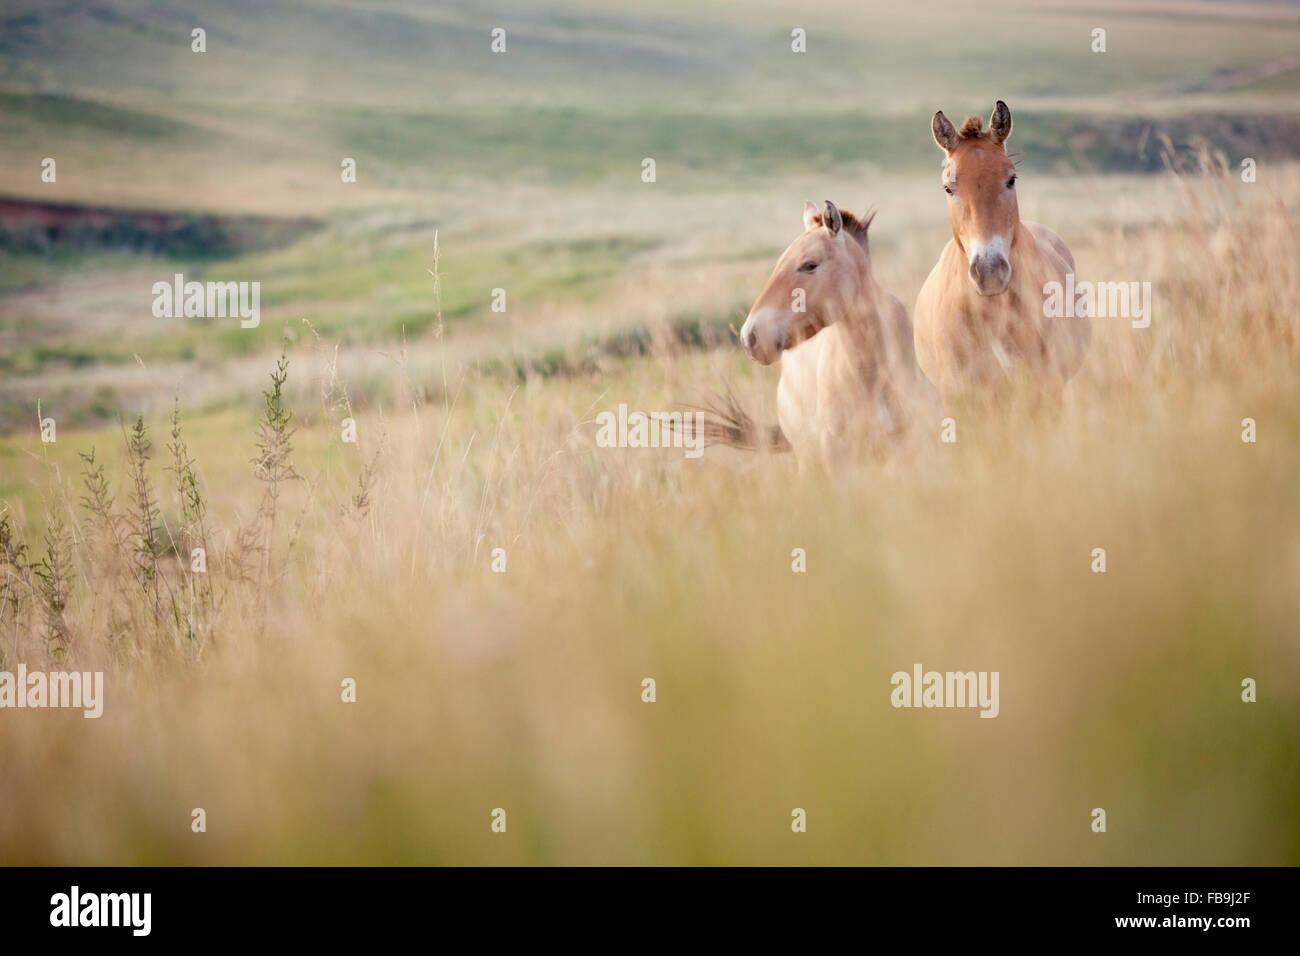 Wild Przewalski's horses in Khustain Nuruu National Park, Mongolia. - Stock Image